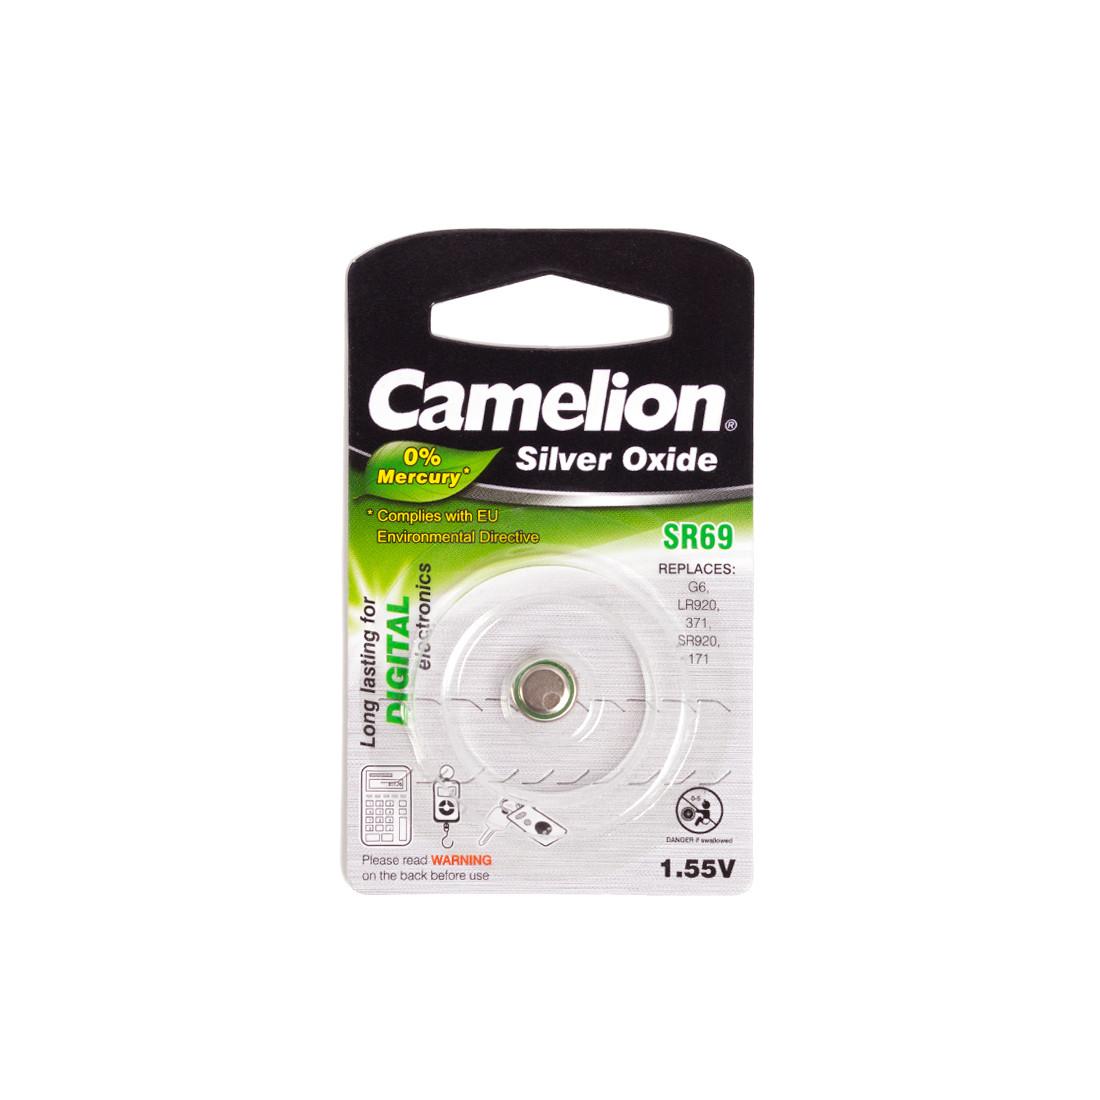 Батарейка CAMELION SR69-BP1(0%Hg)  Silver Oxide 1.55V 0% Ртути 1 шт. Блистер